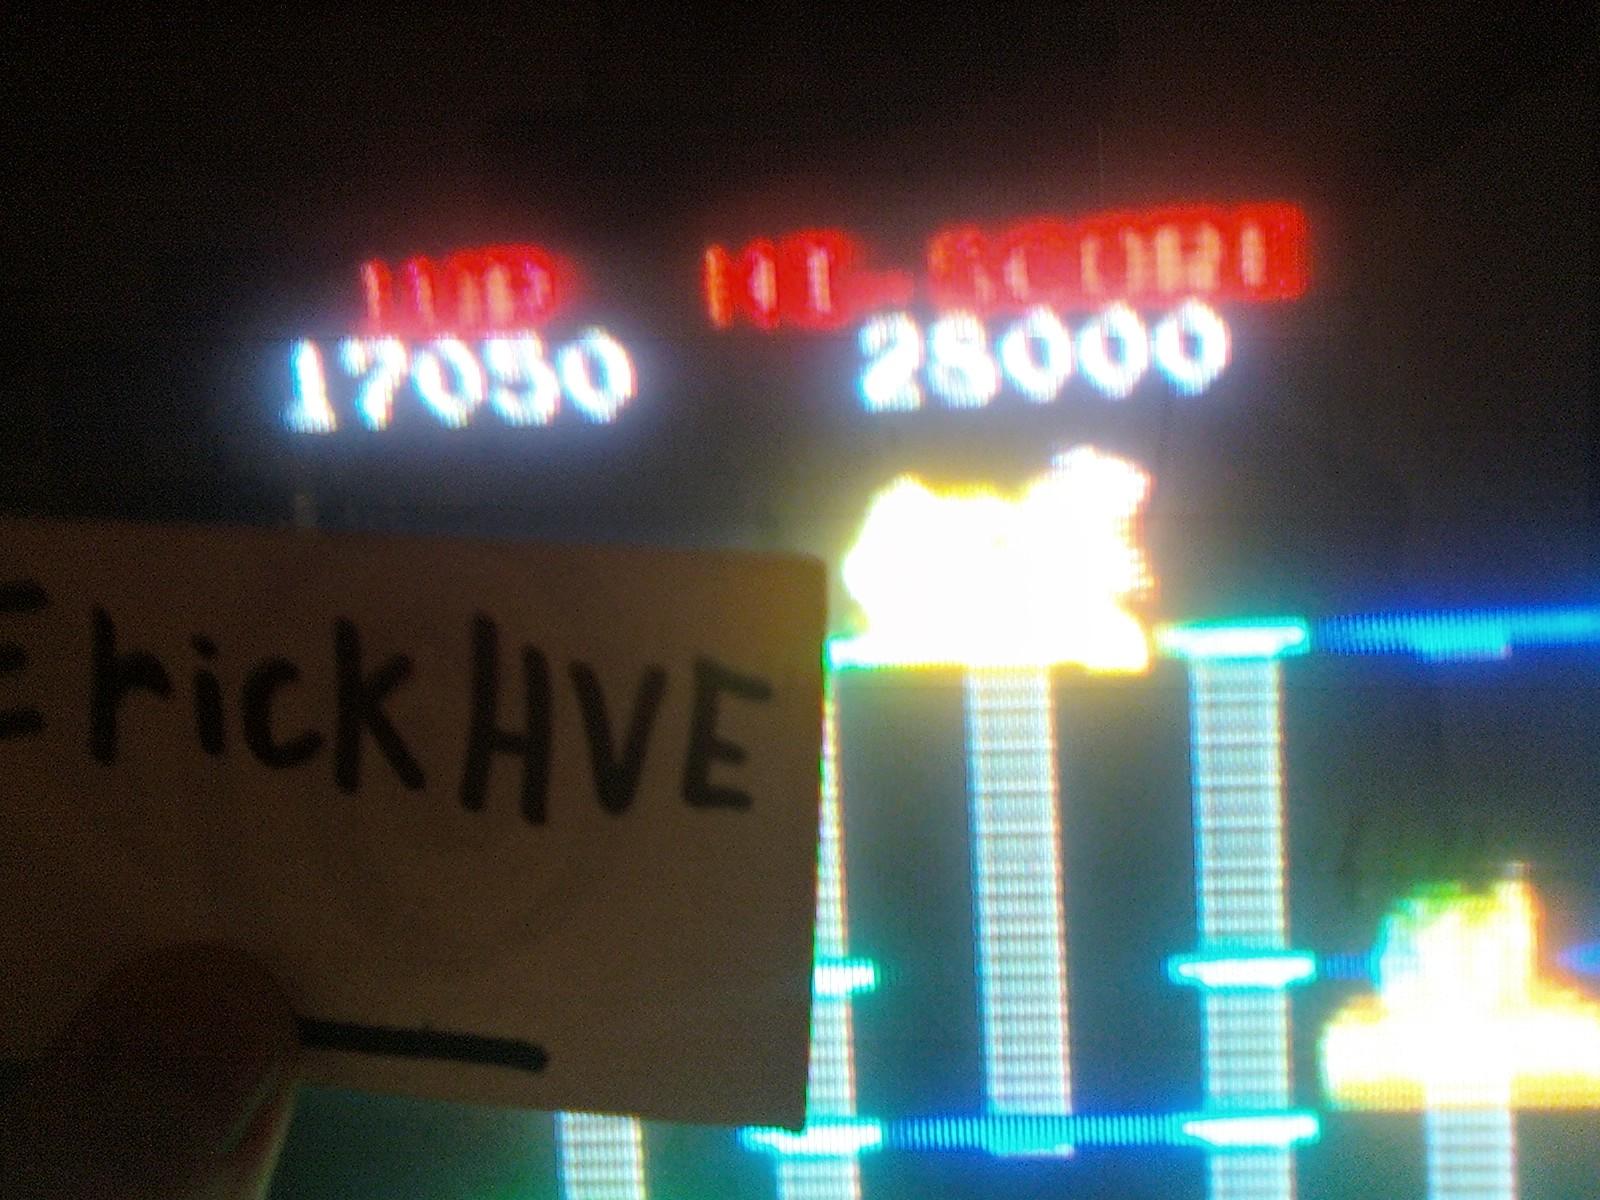 BurgerTime 17,050 points